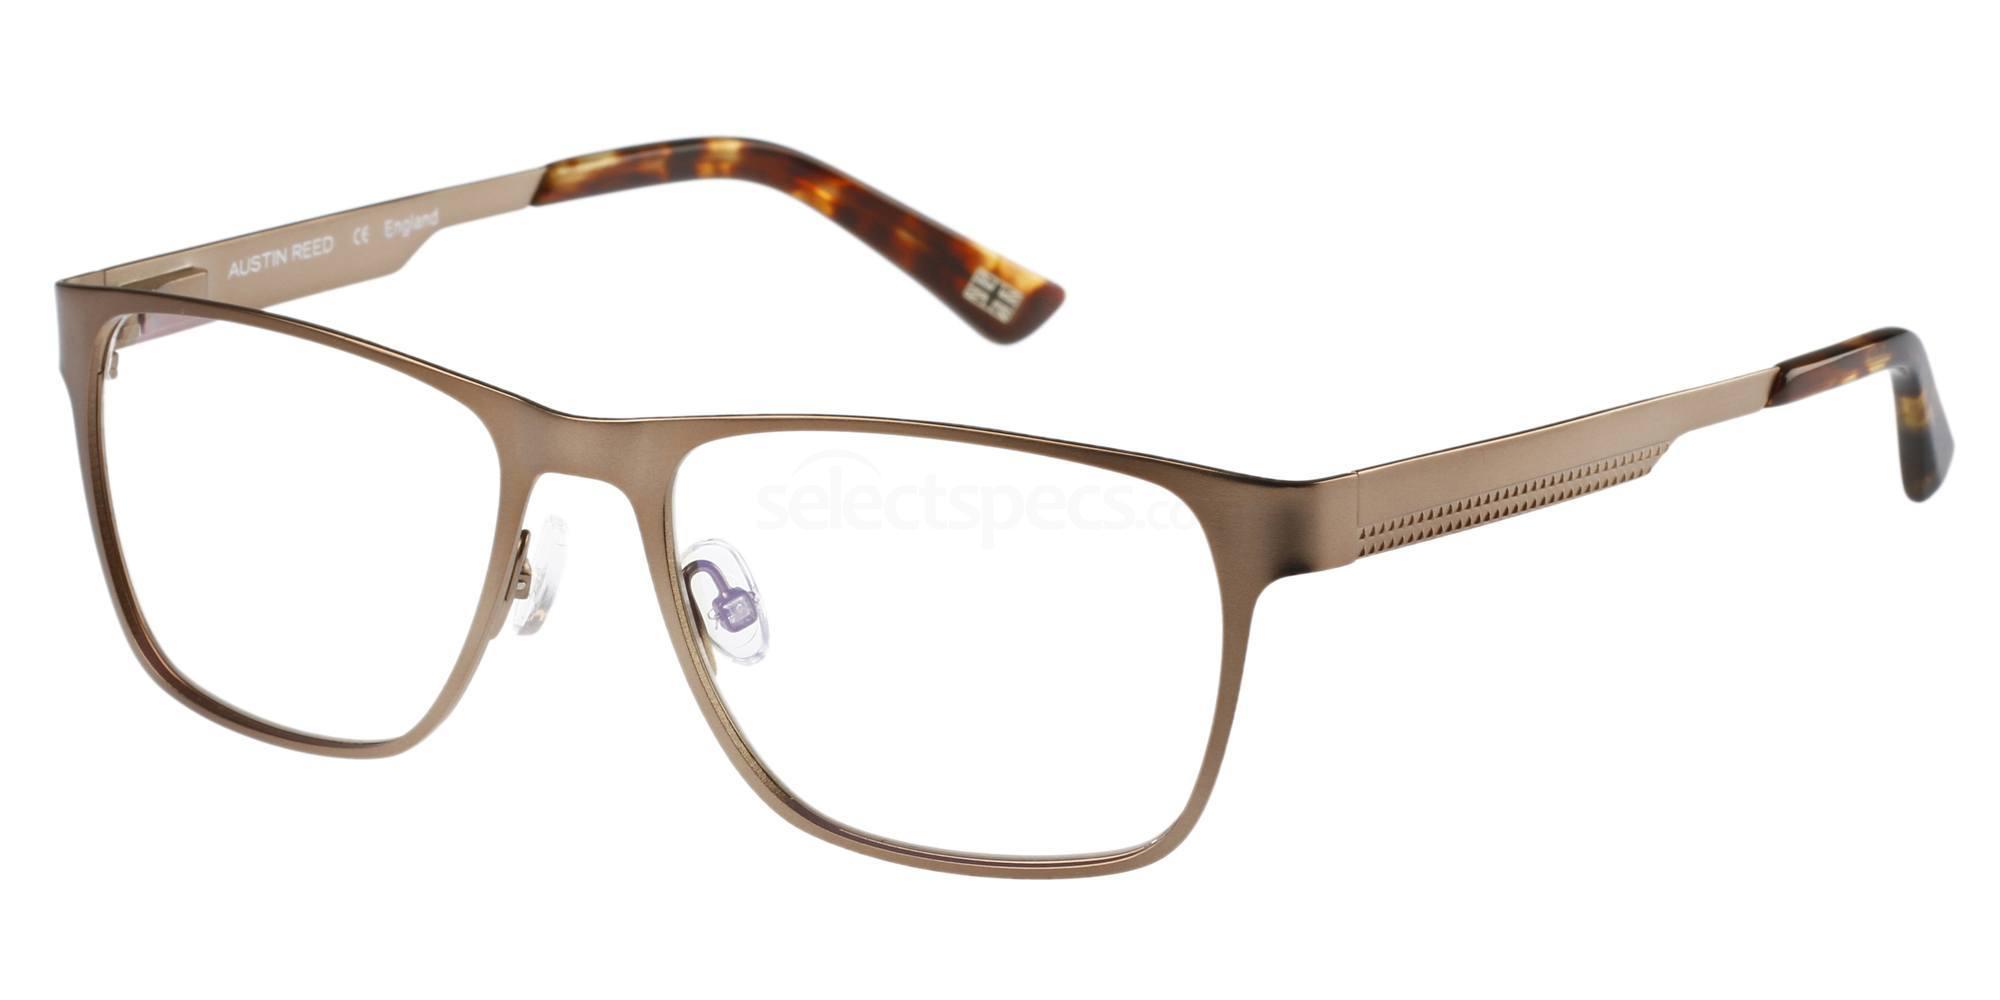 011 AR-B04 Glasses, Austin Reed